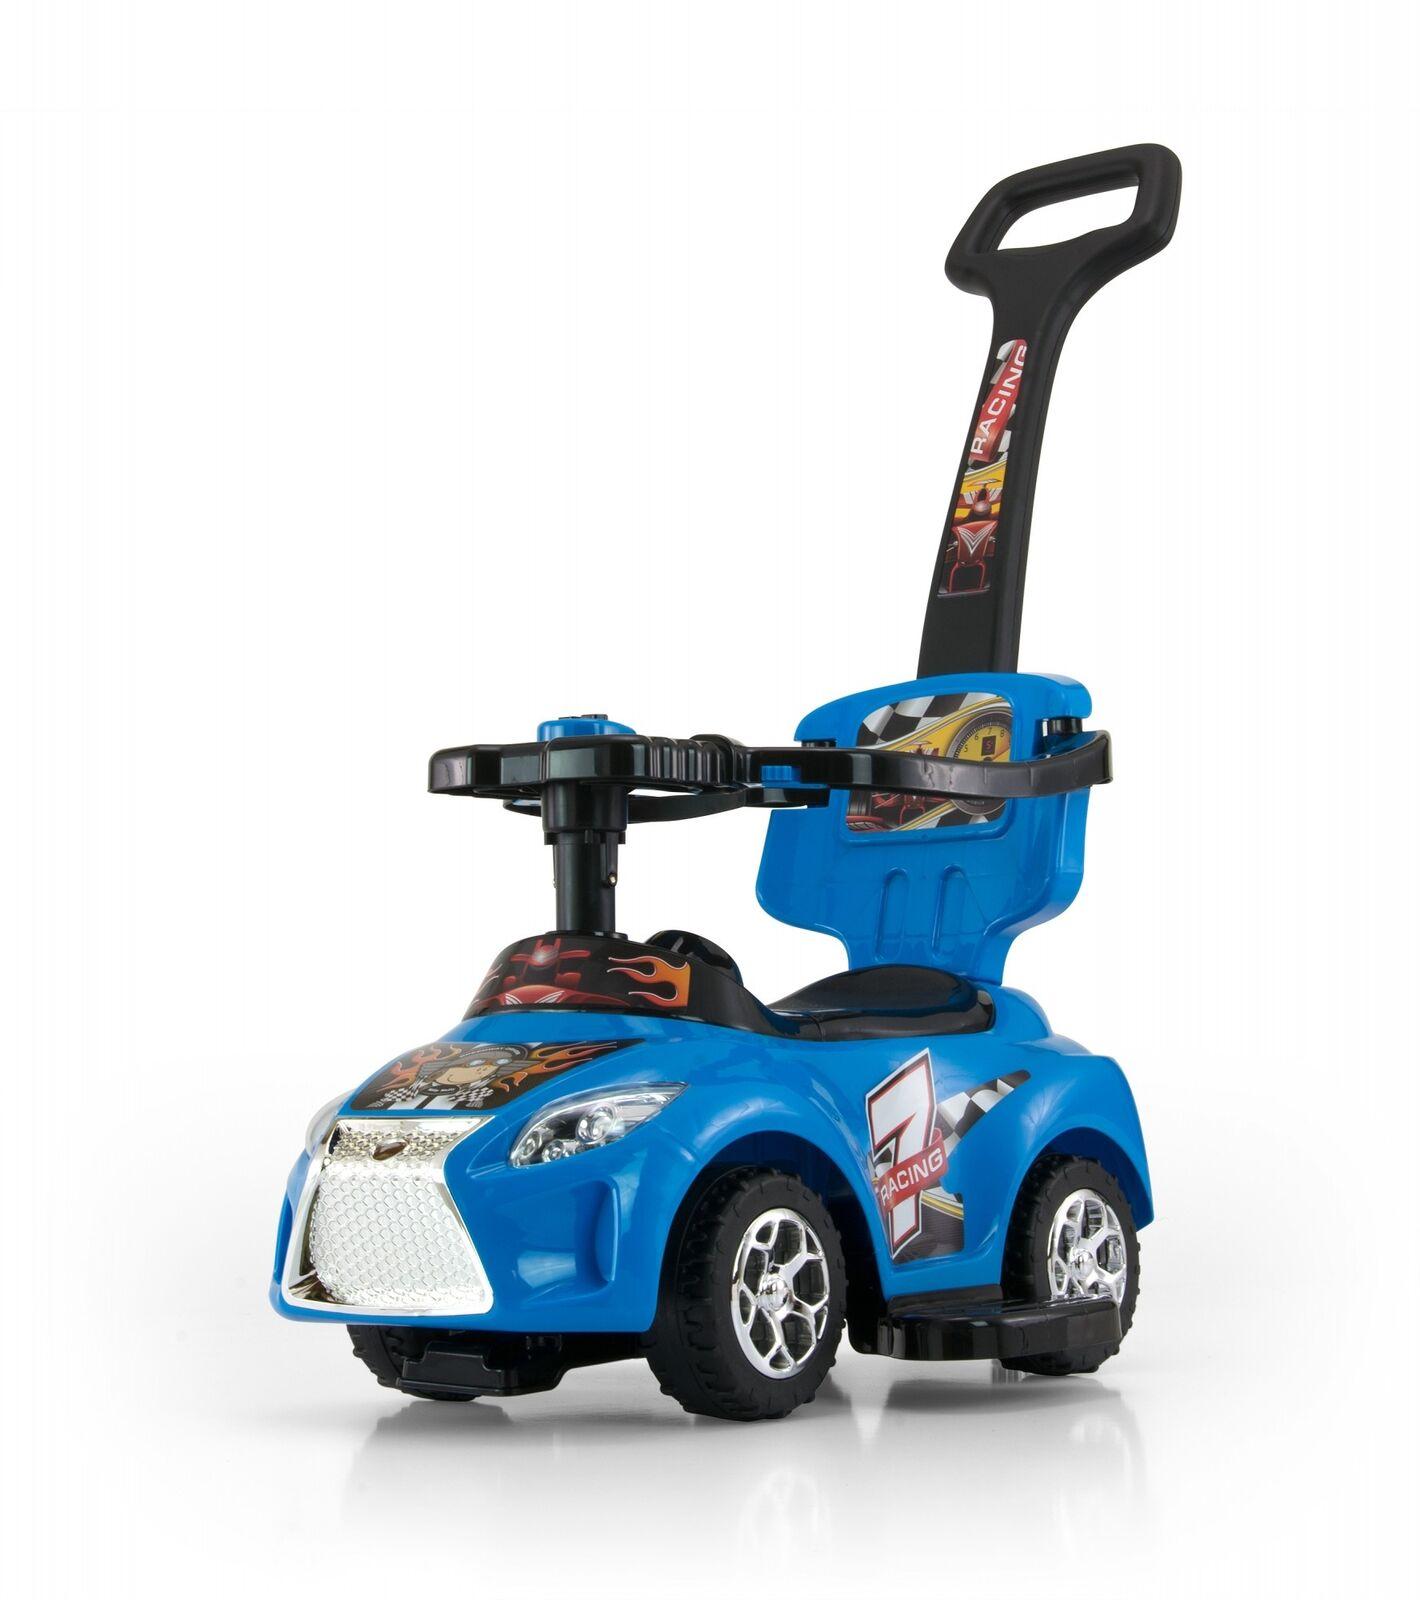 3 in 1 Rutschauto Rutscher Kinderauto abnehmbarer Schubstange Schubstange abnehmbarer aufklappbarer Sitz 110660